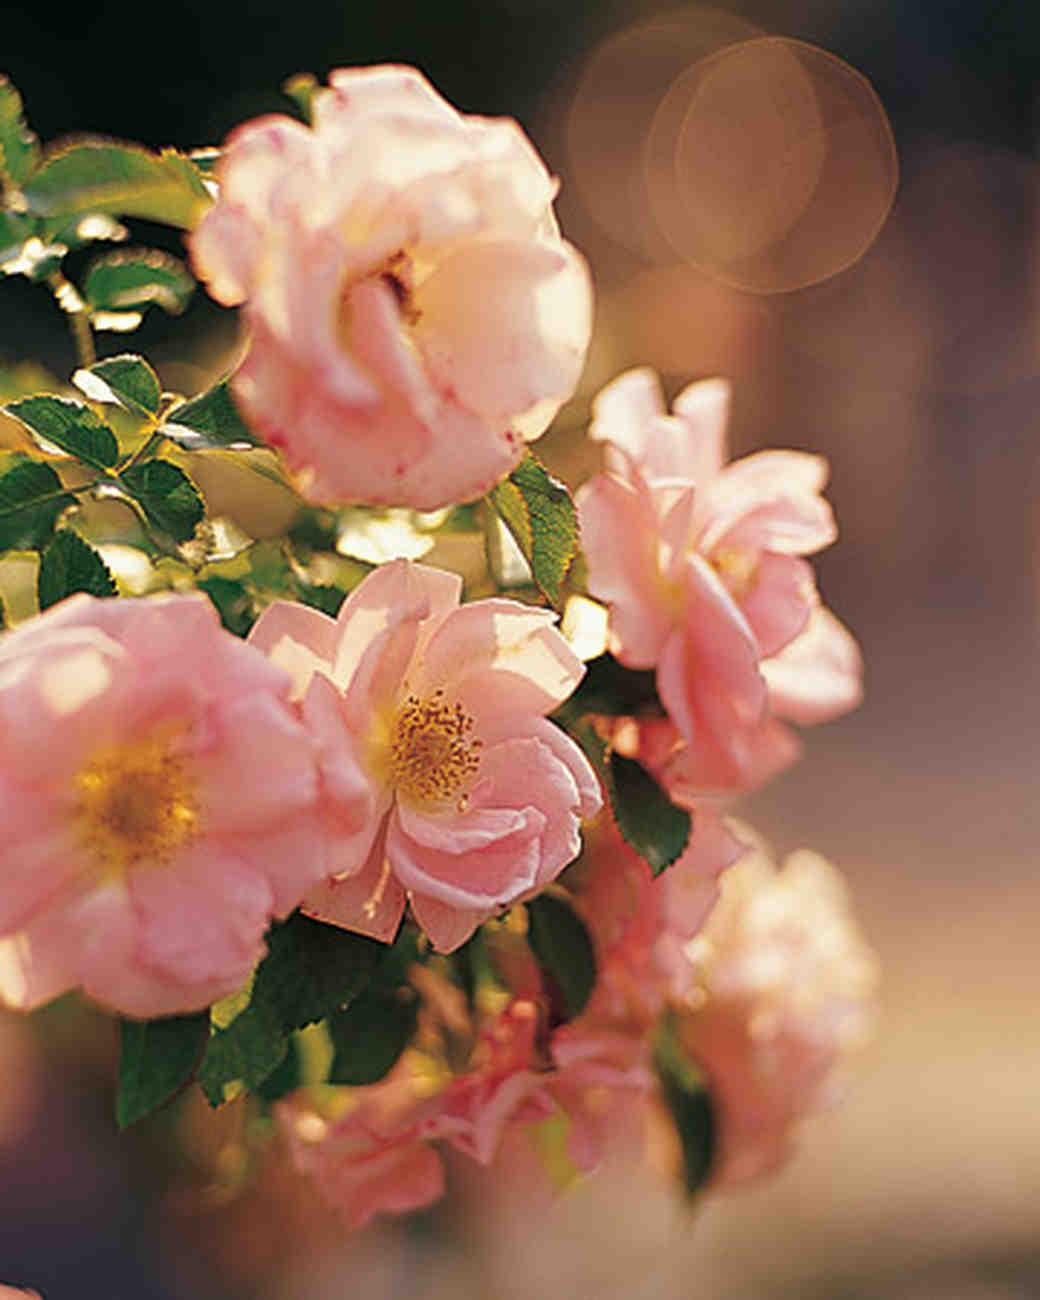 mw0404_spr04_garden_rose.jpg